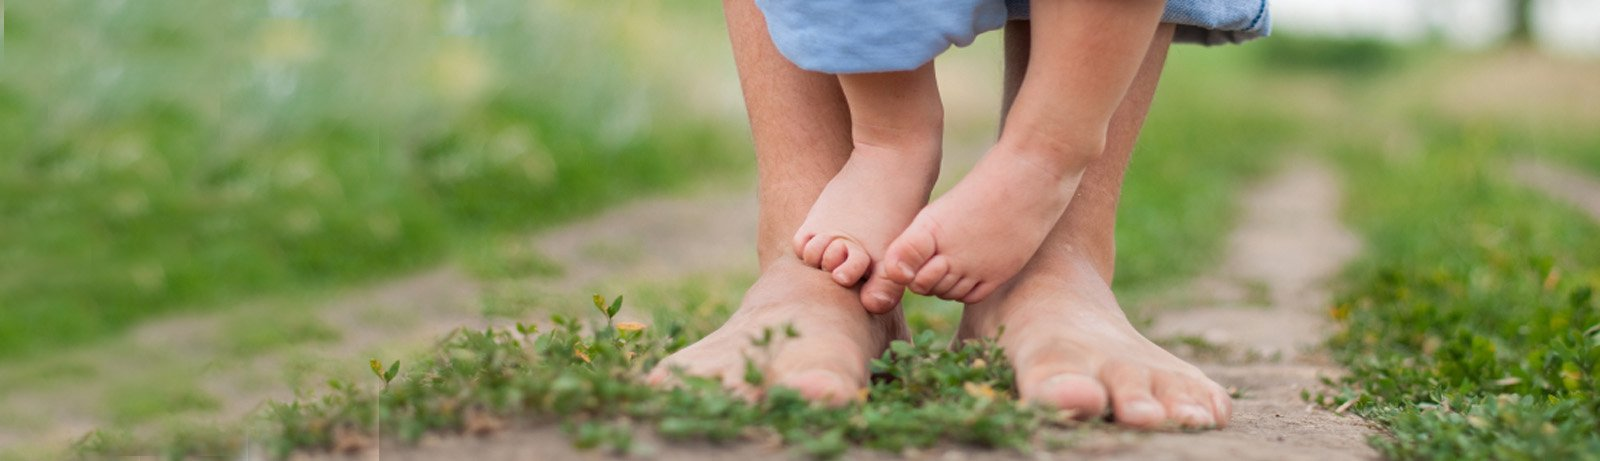 slider_baby_feet